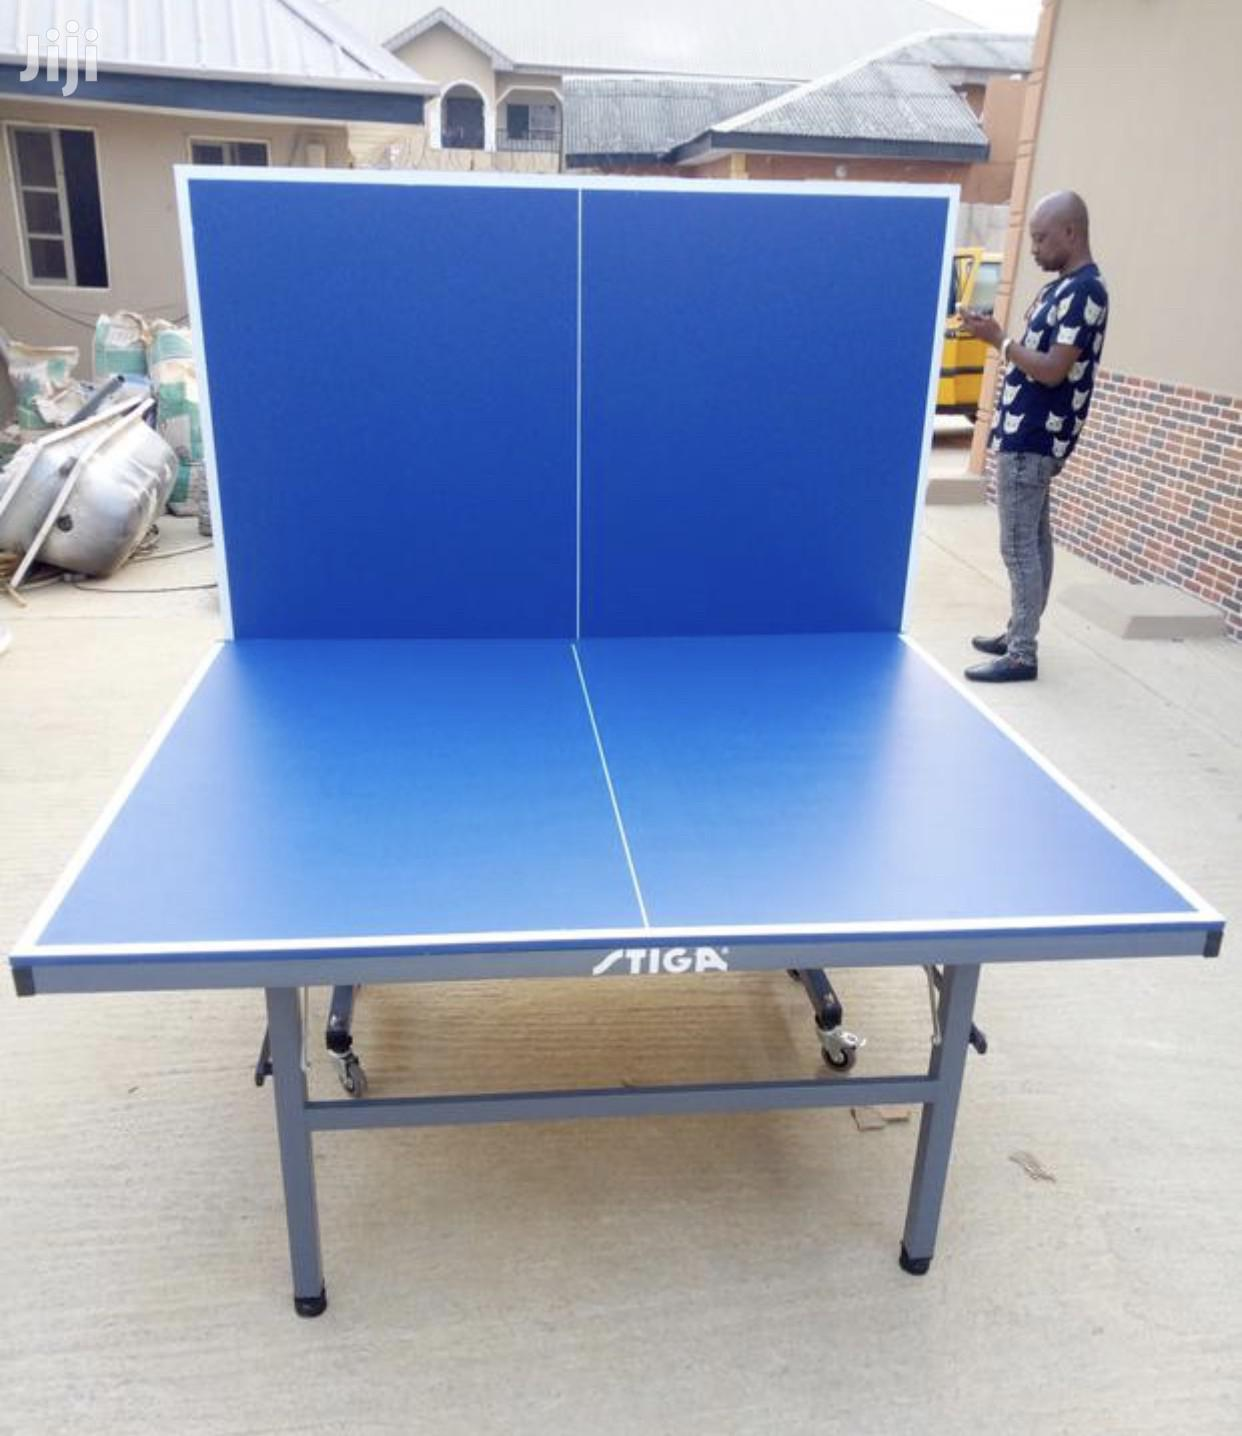 Stiga Outdoor Table Tennis Board (Water Resistant)